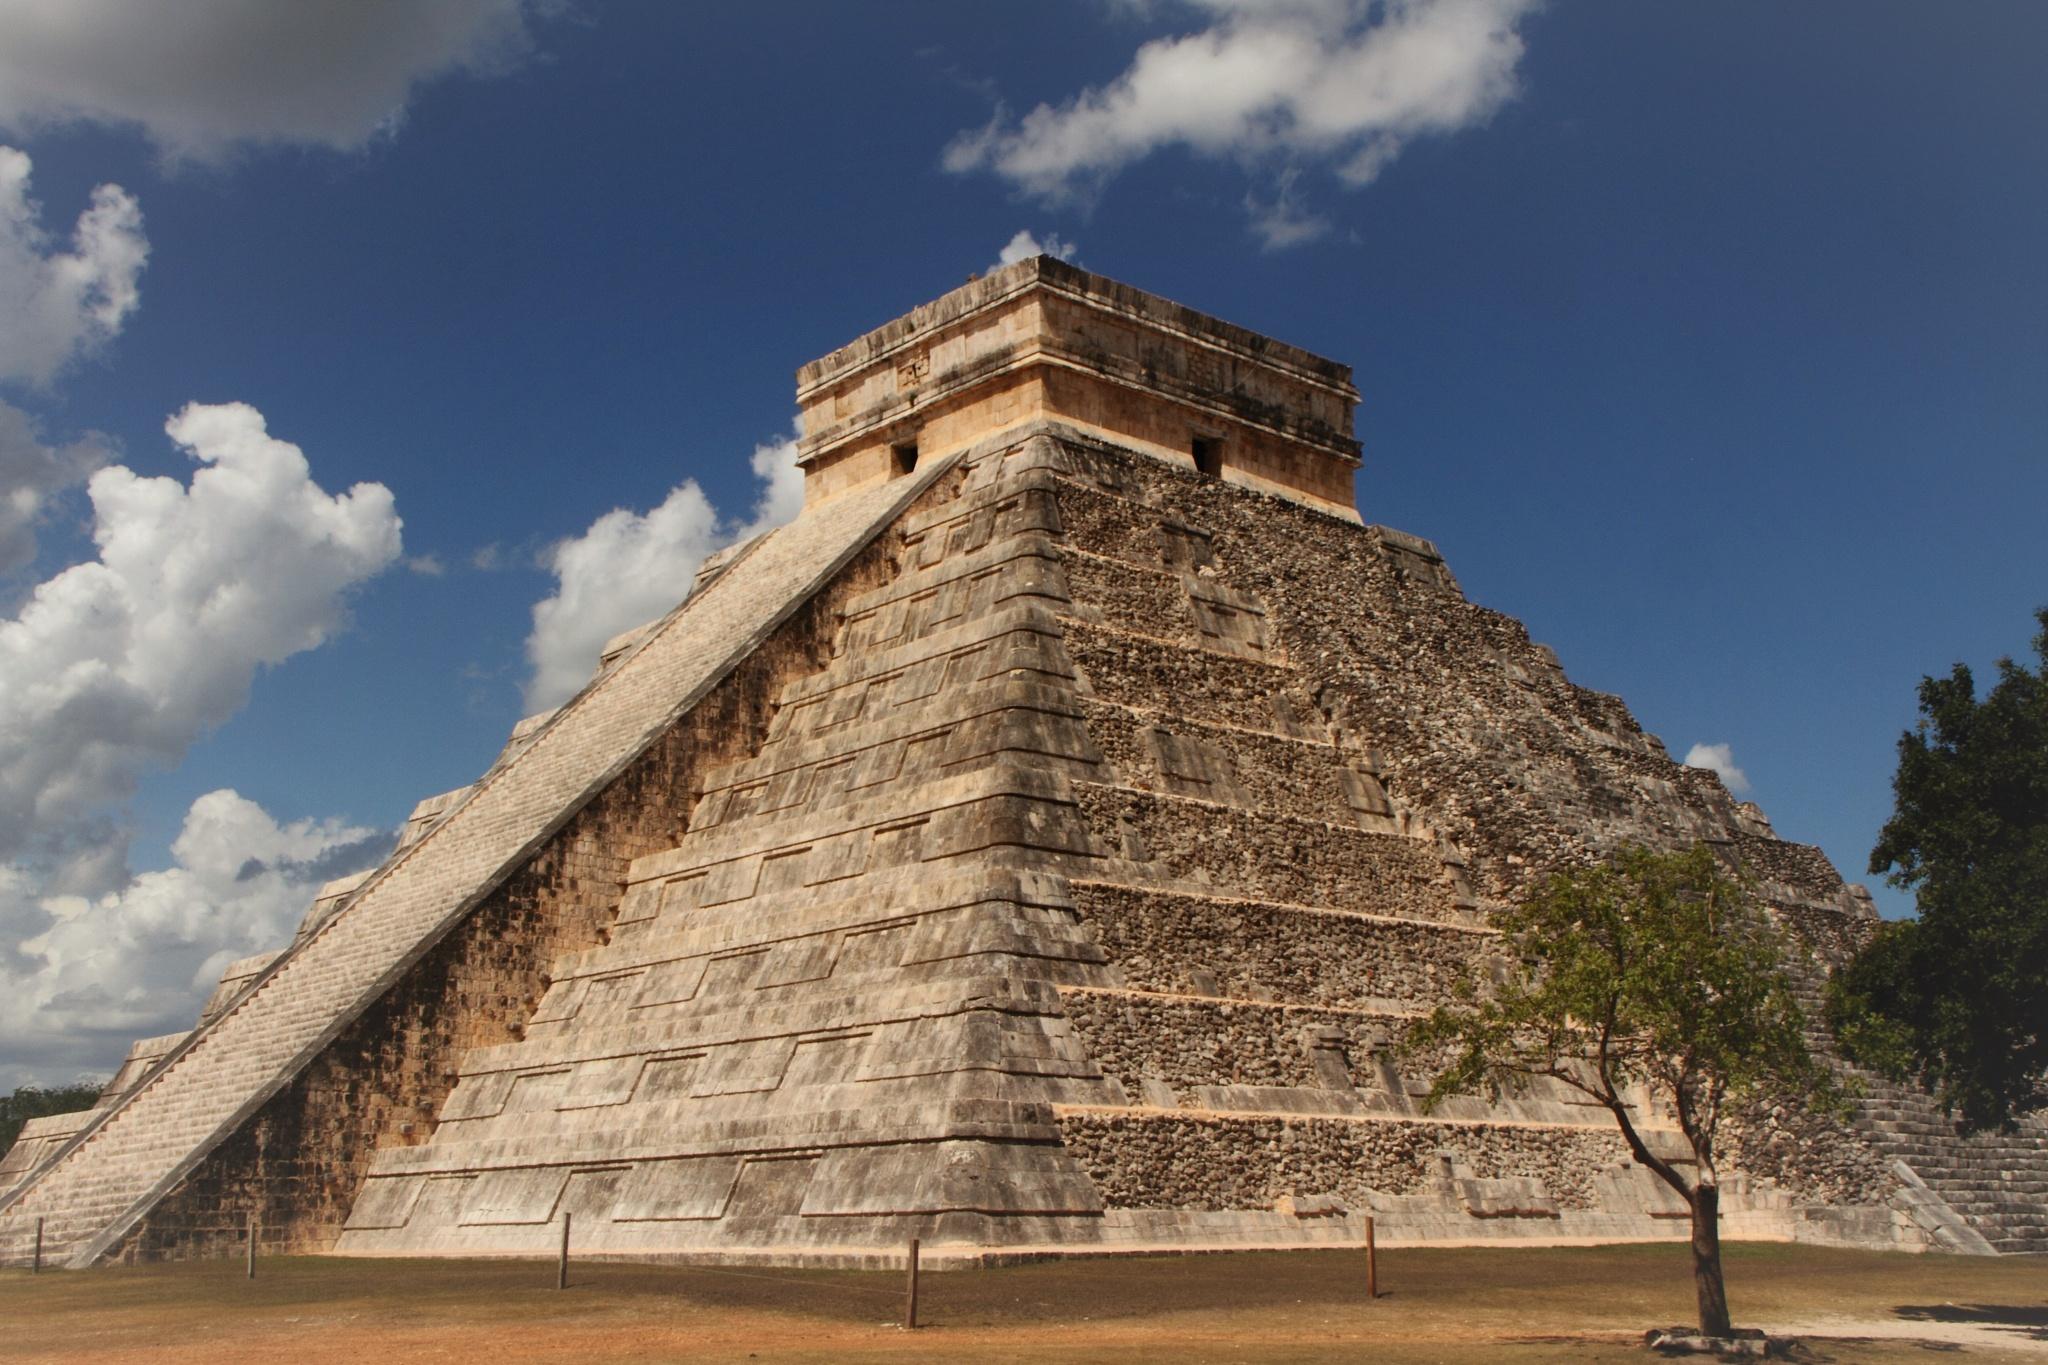 Mayan Pyramid by Blake Fruia